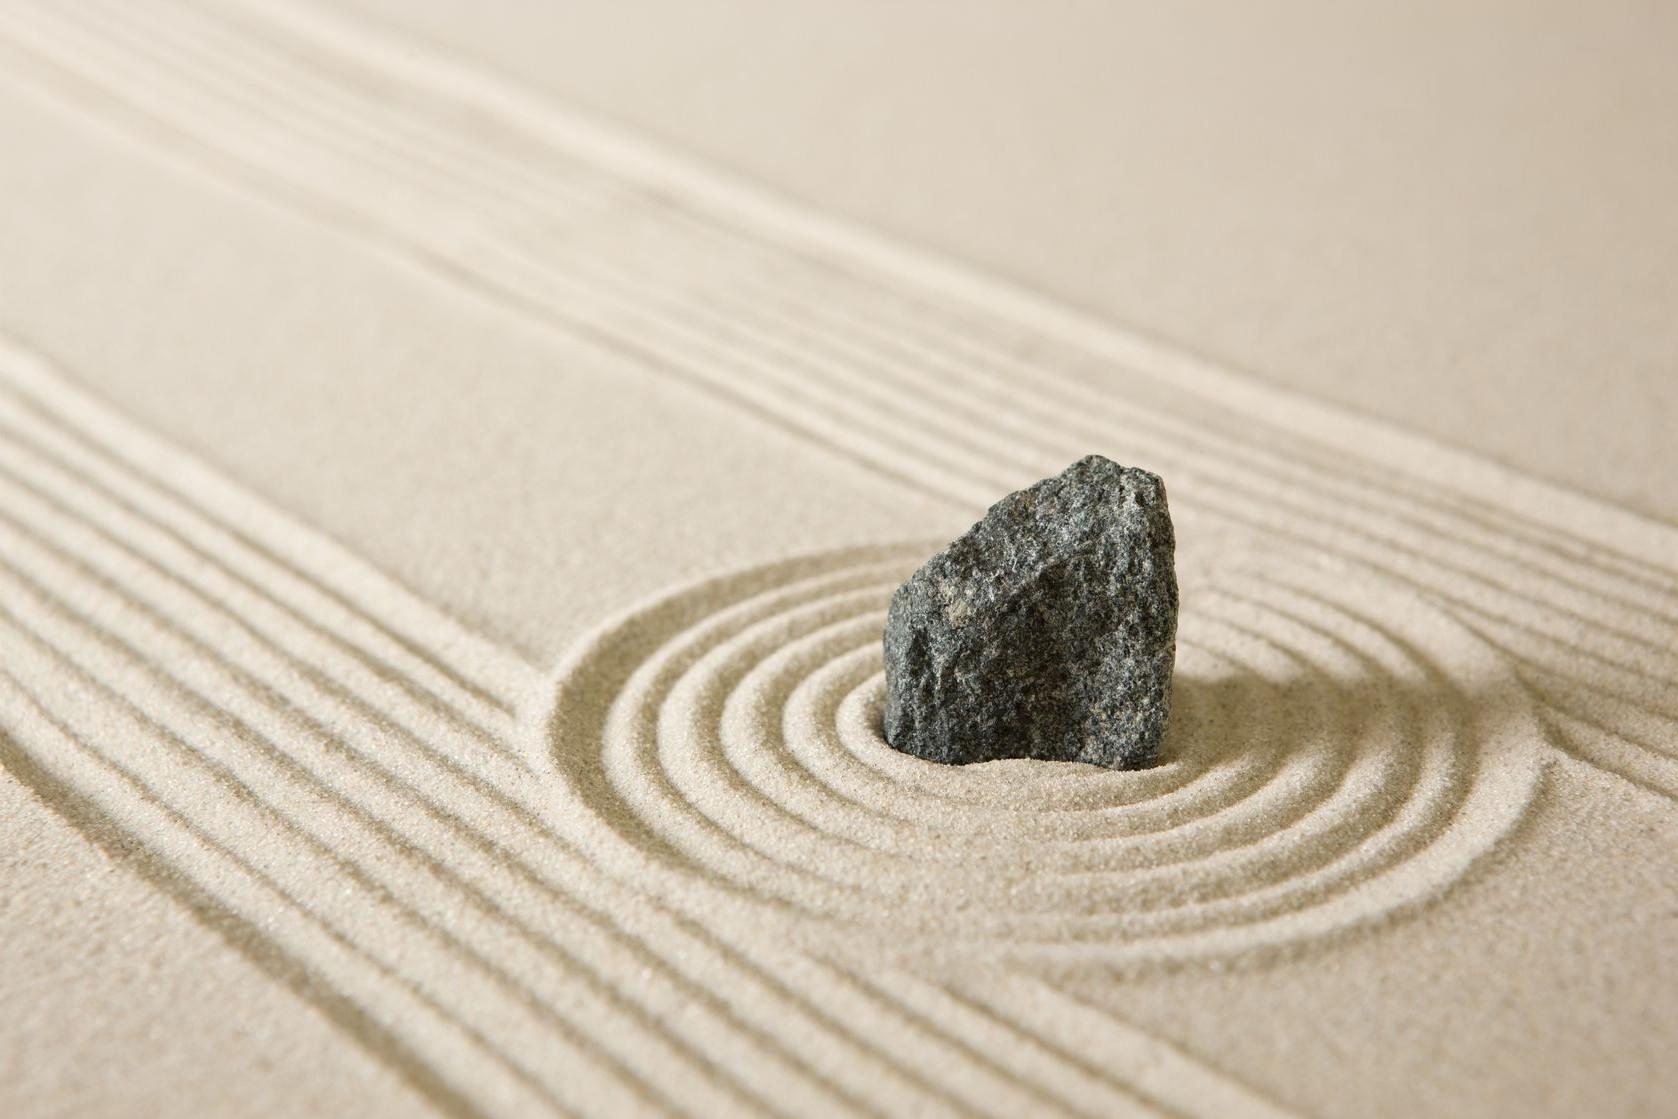 1678x1119 Px Calm Circle Depth Of Field Garden Grain Lines Nature Rock Sand Stone Zen